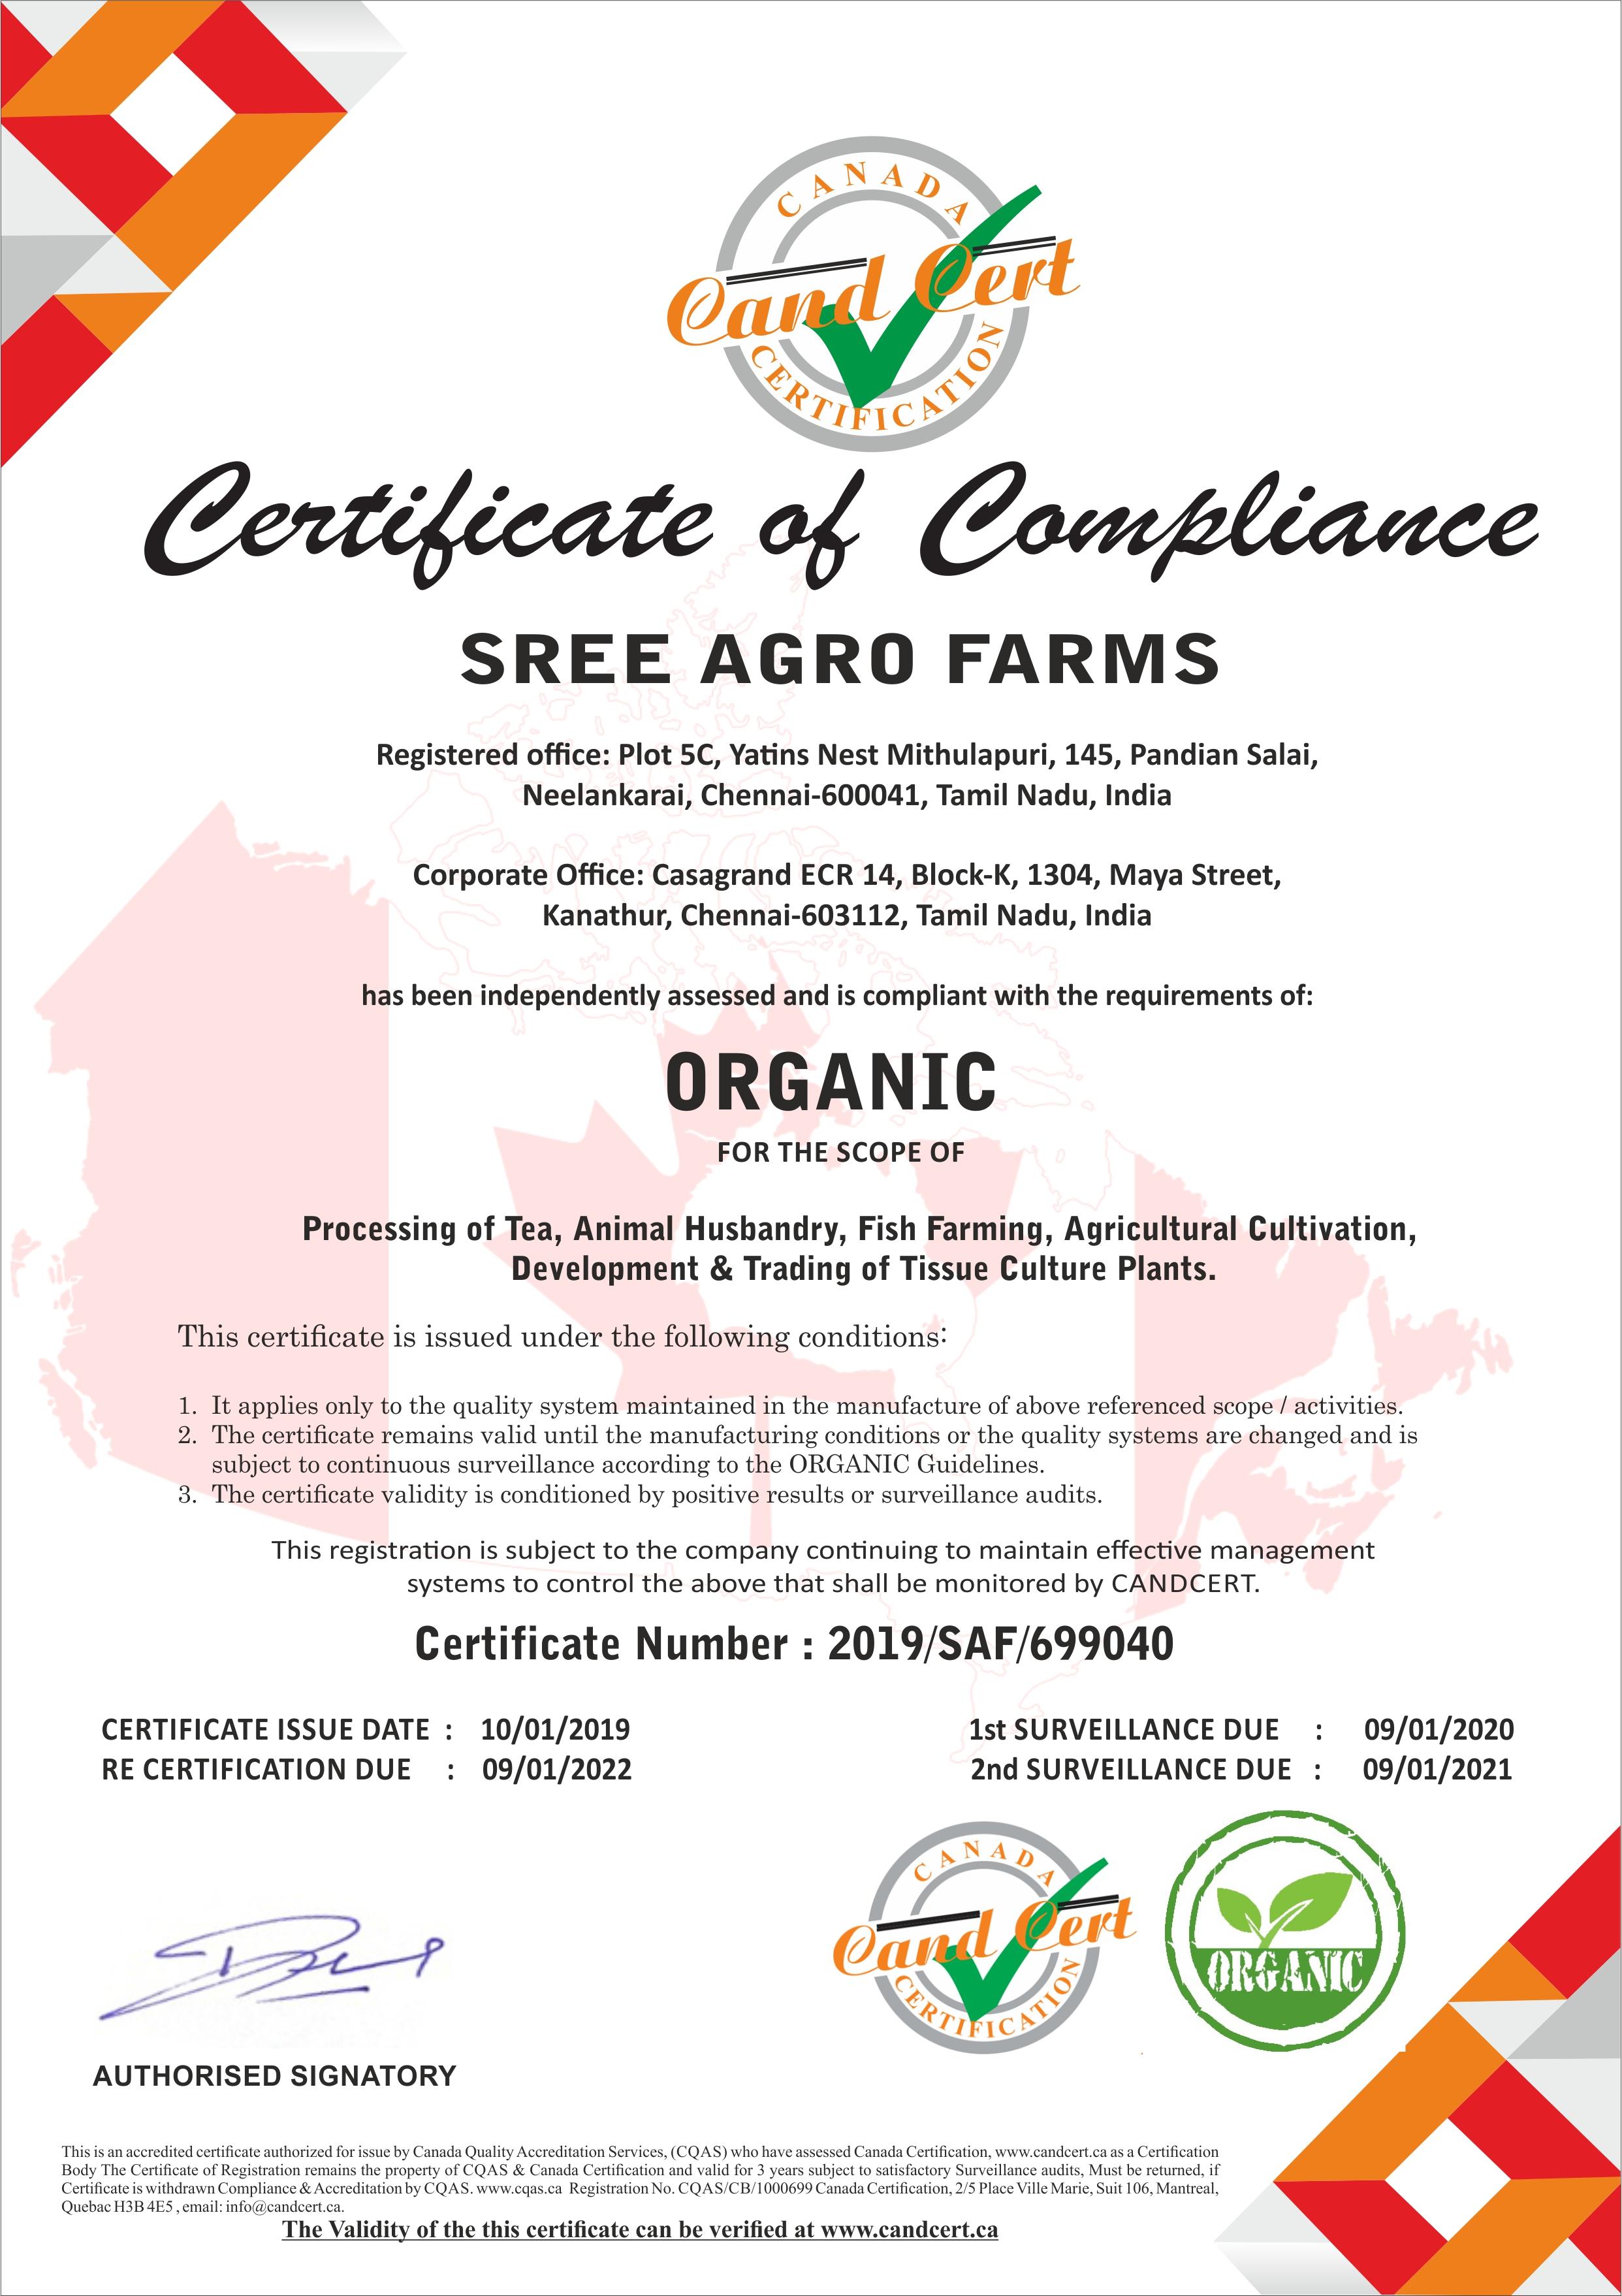 SREE AGRO FARMS